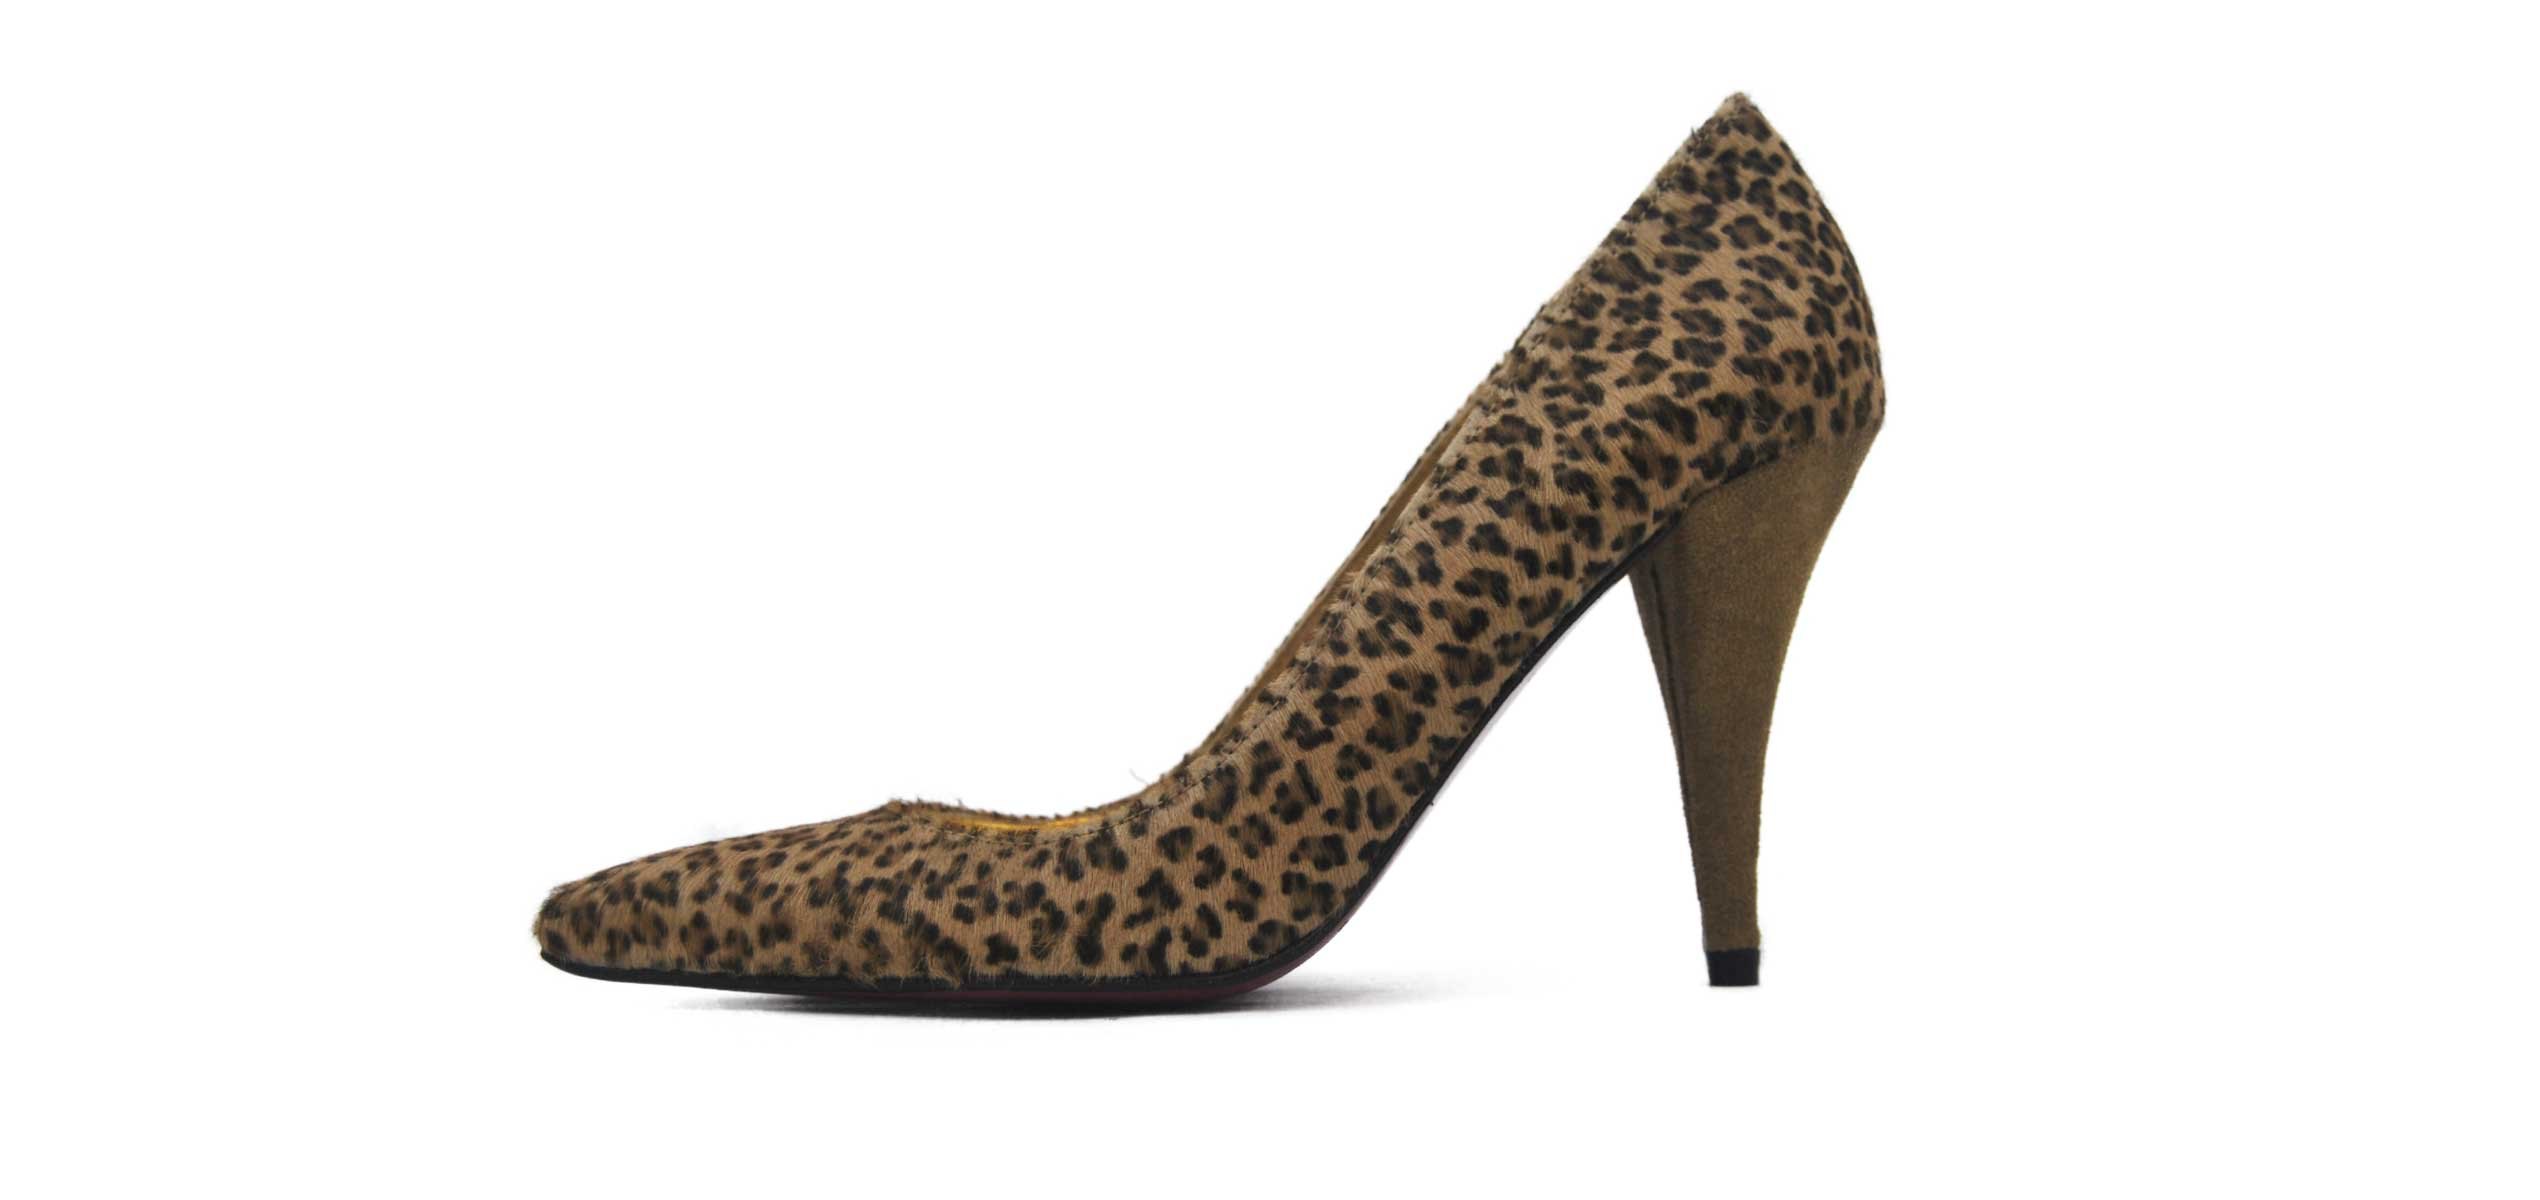 Foto 1 de Zapato Tacon Leopardo